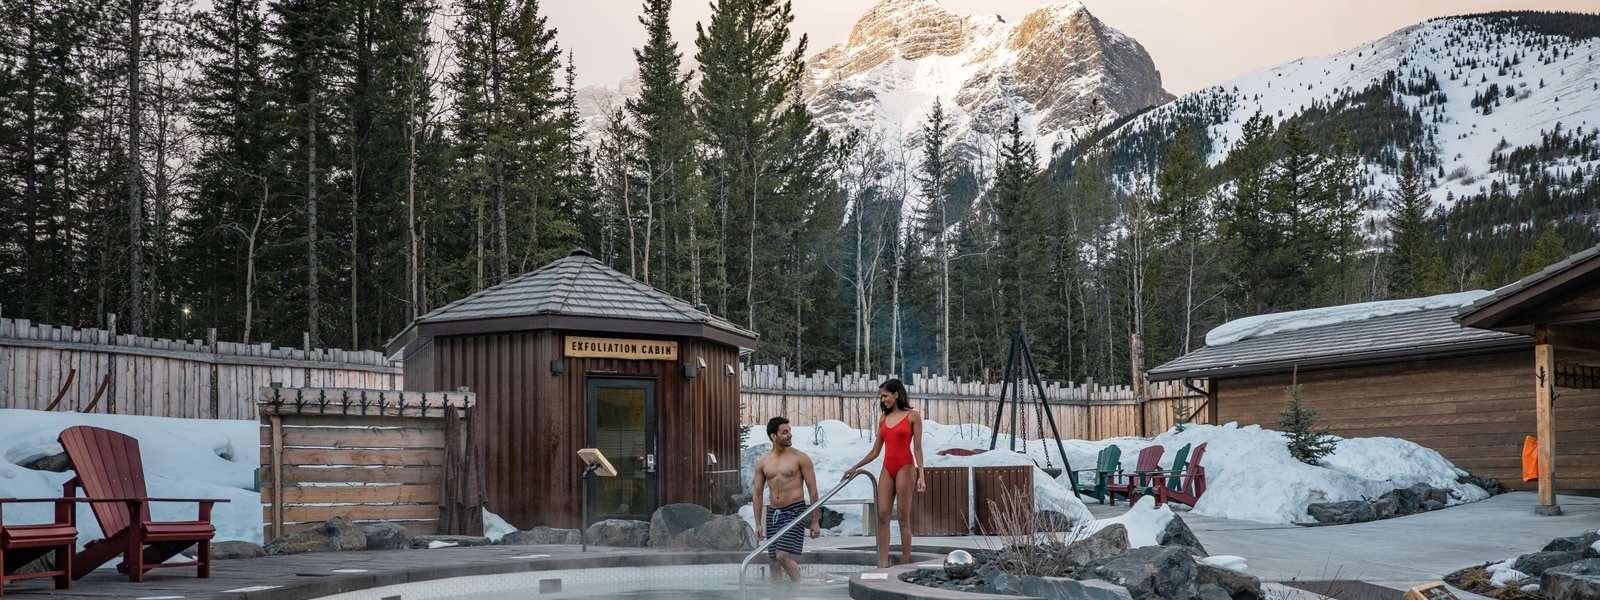 Travel Alberta / Mike Seehagel